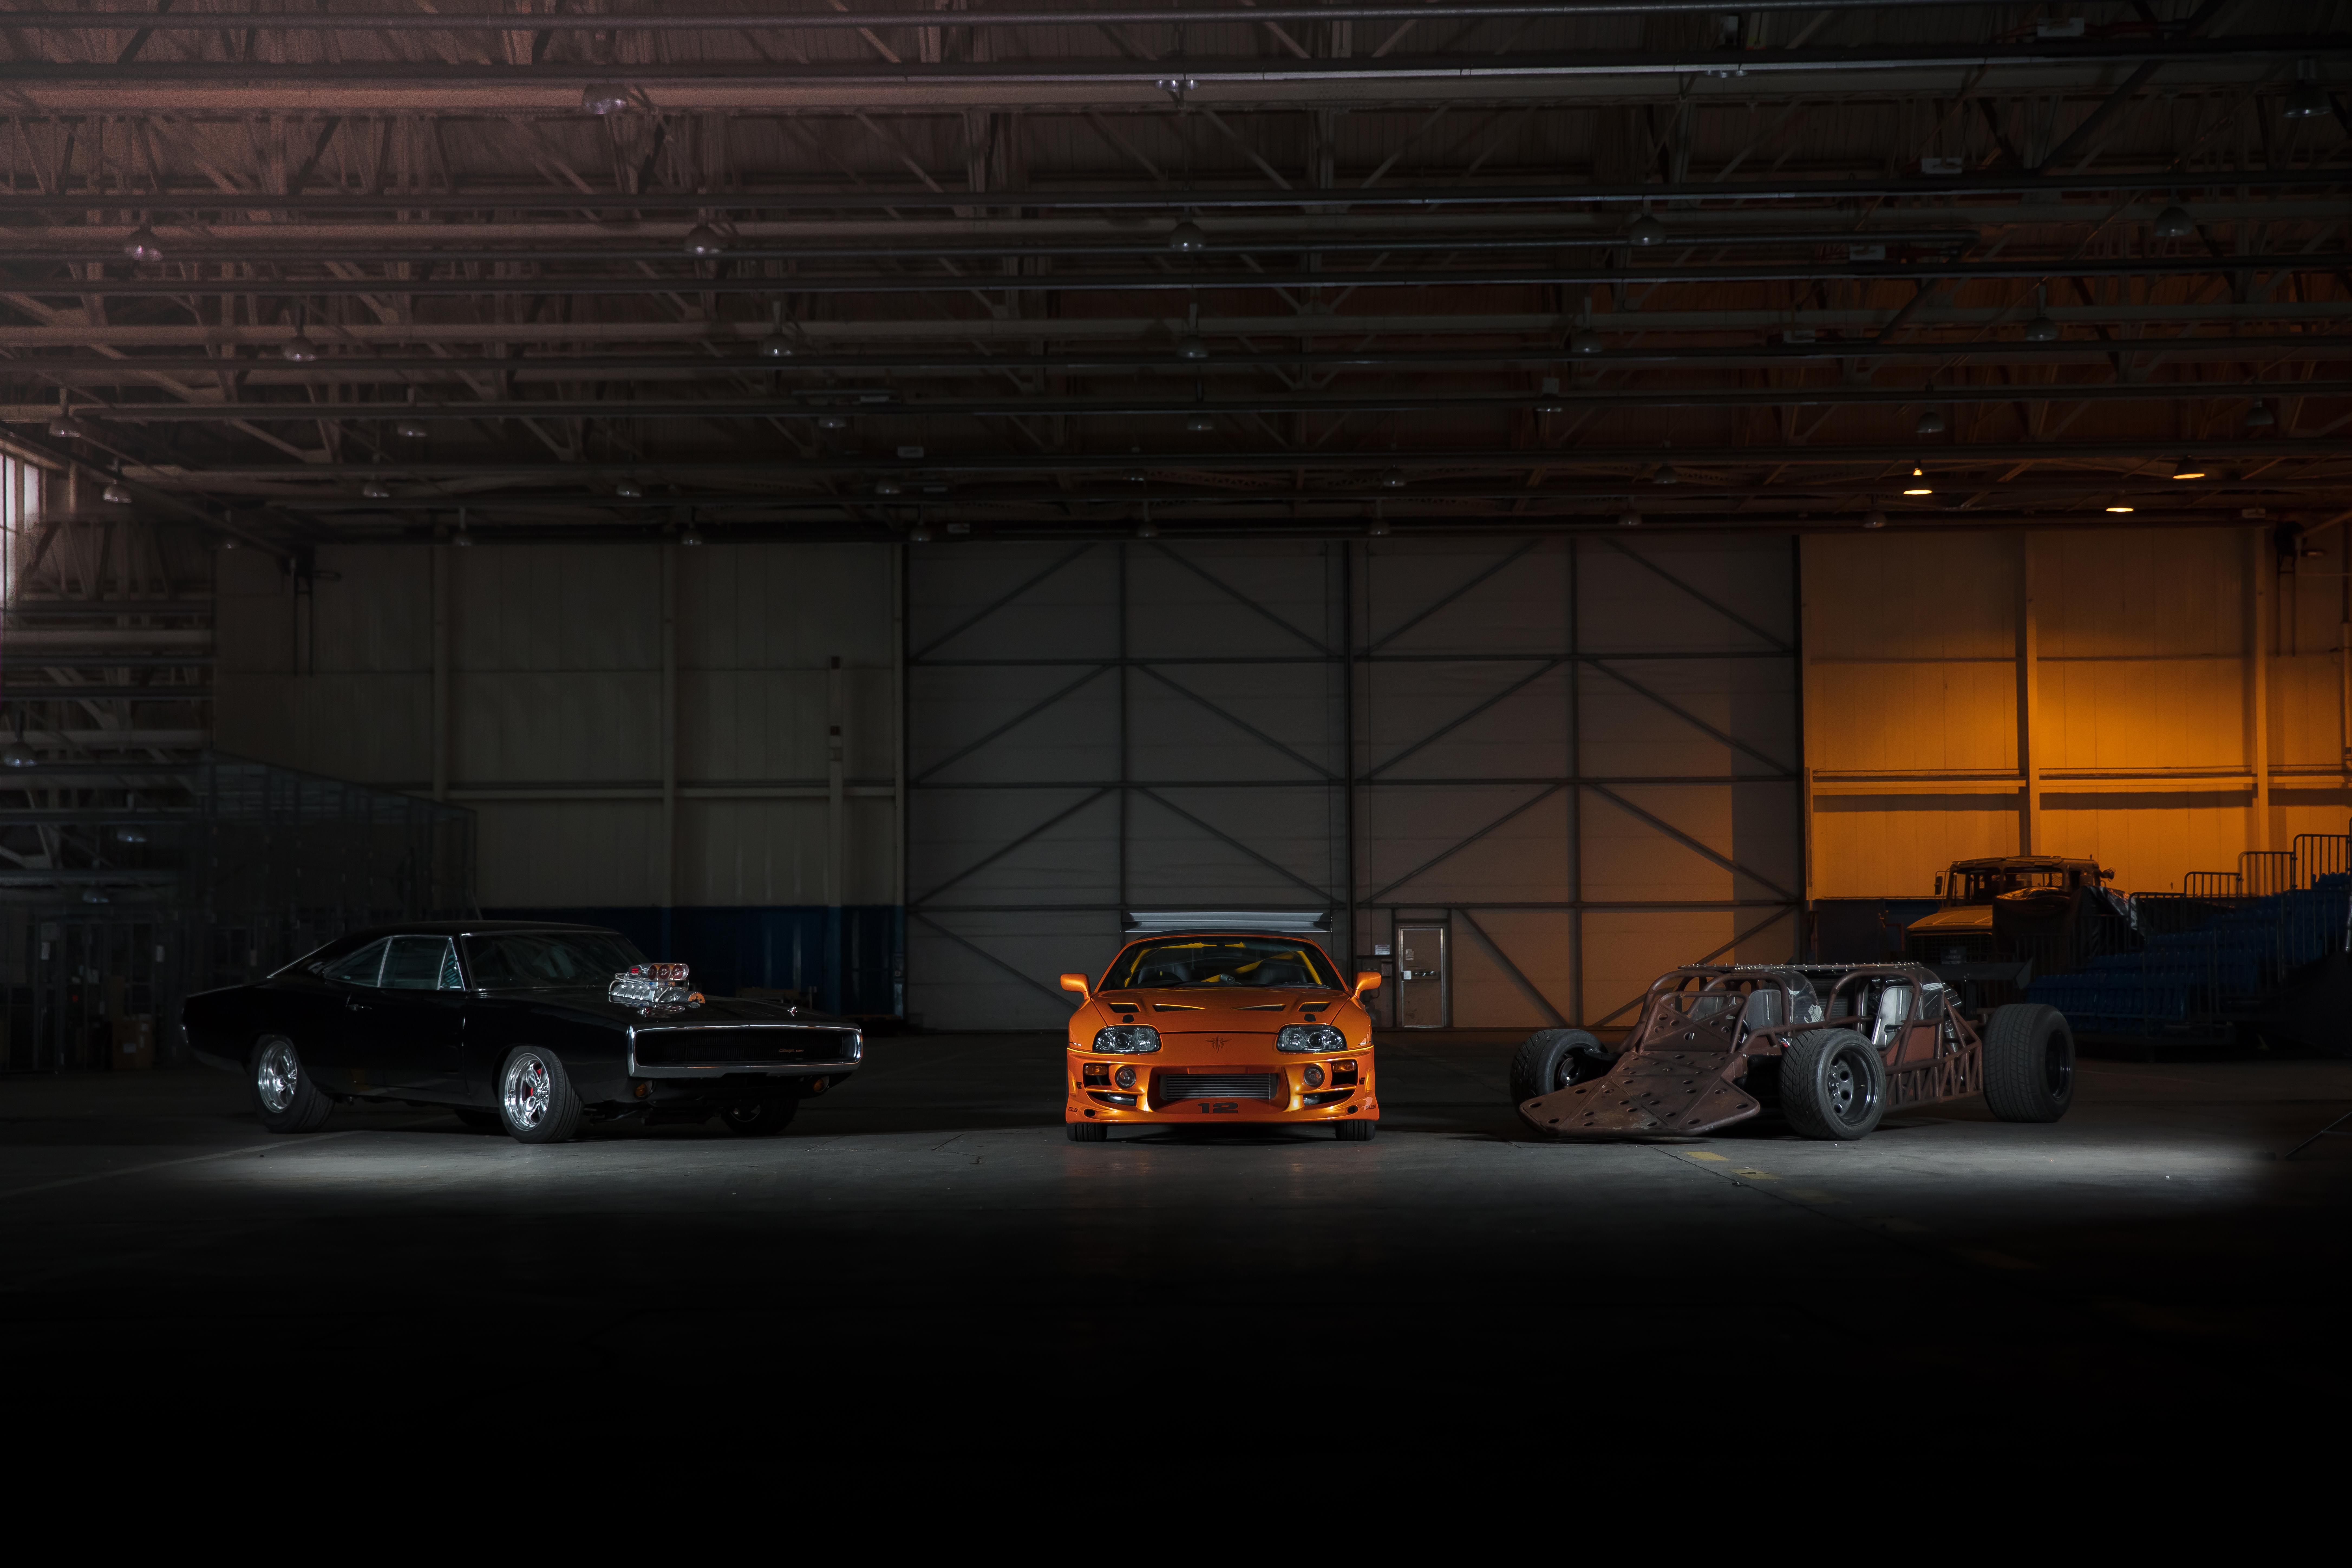 3 cars 2